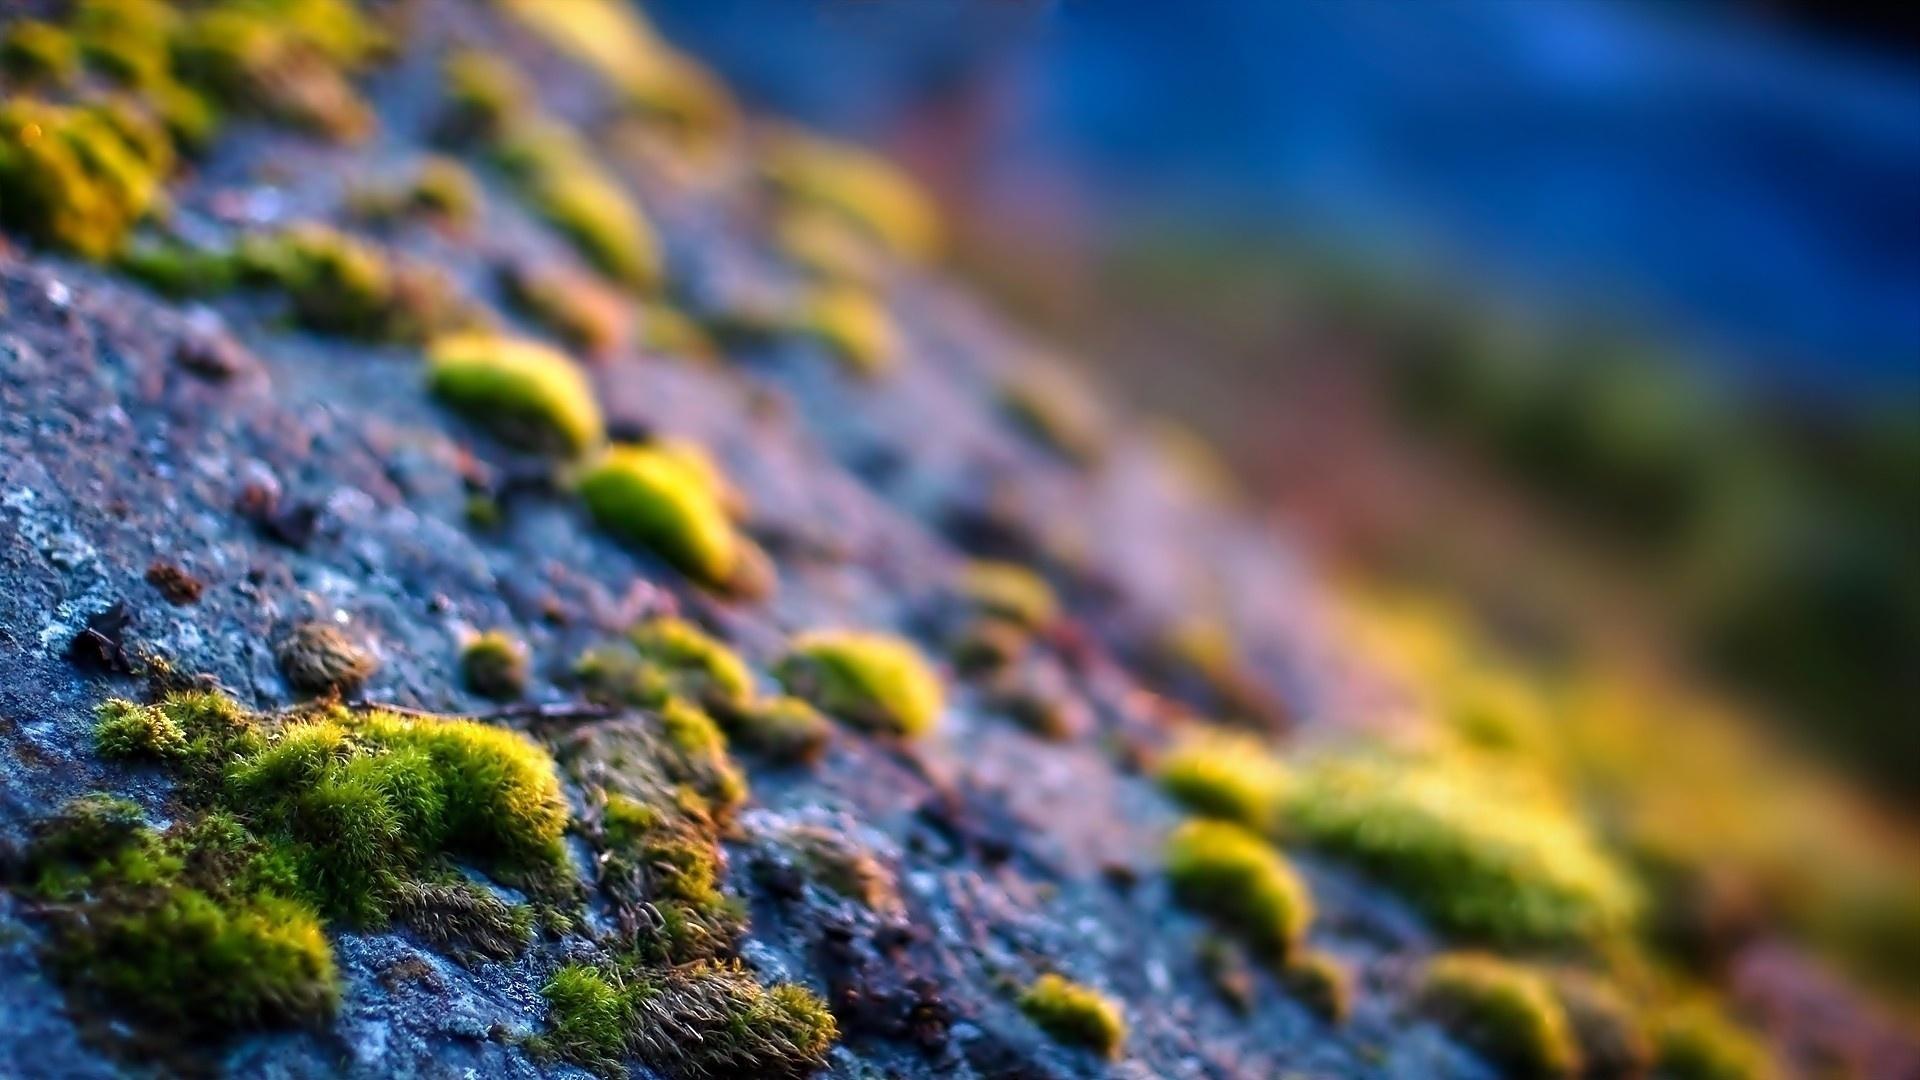 Stones And Moss desktop wallpaper hd